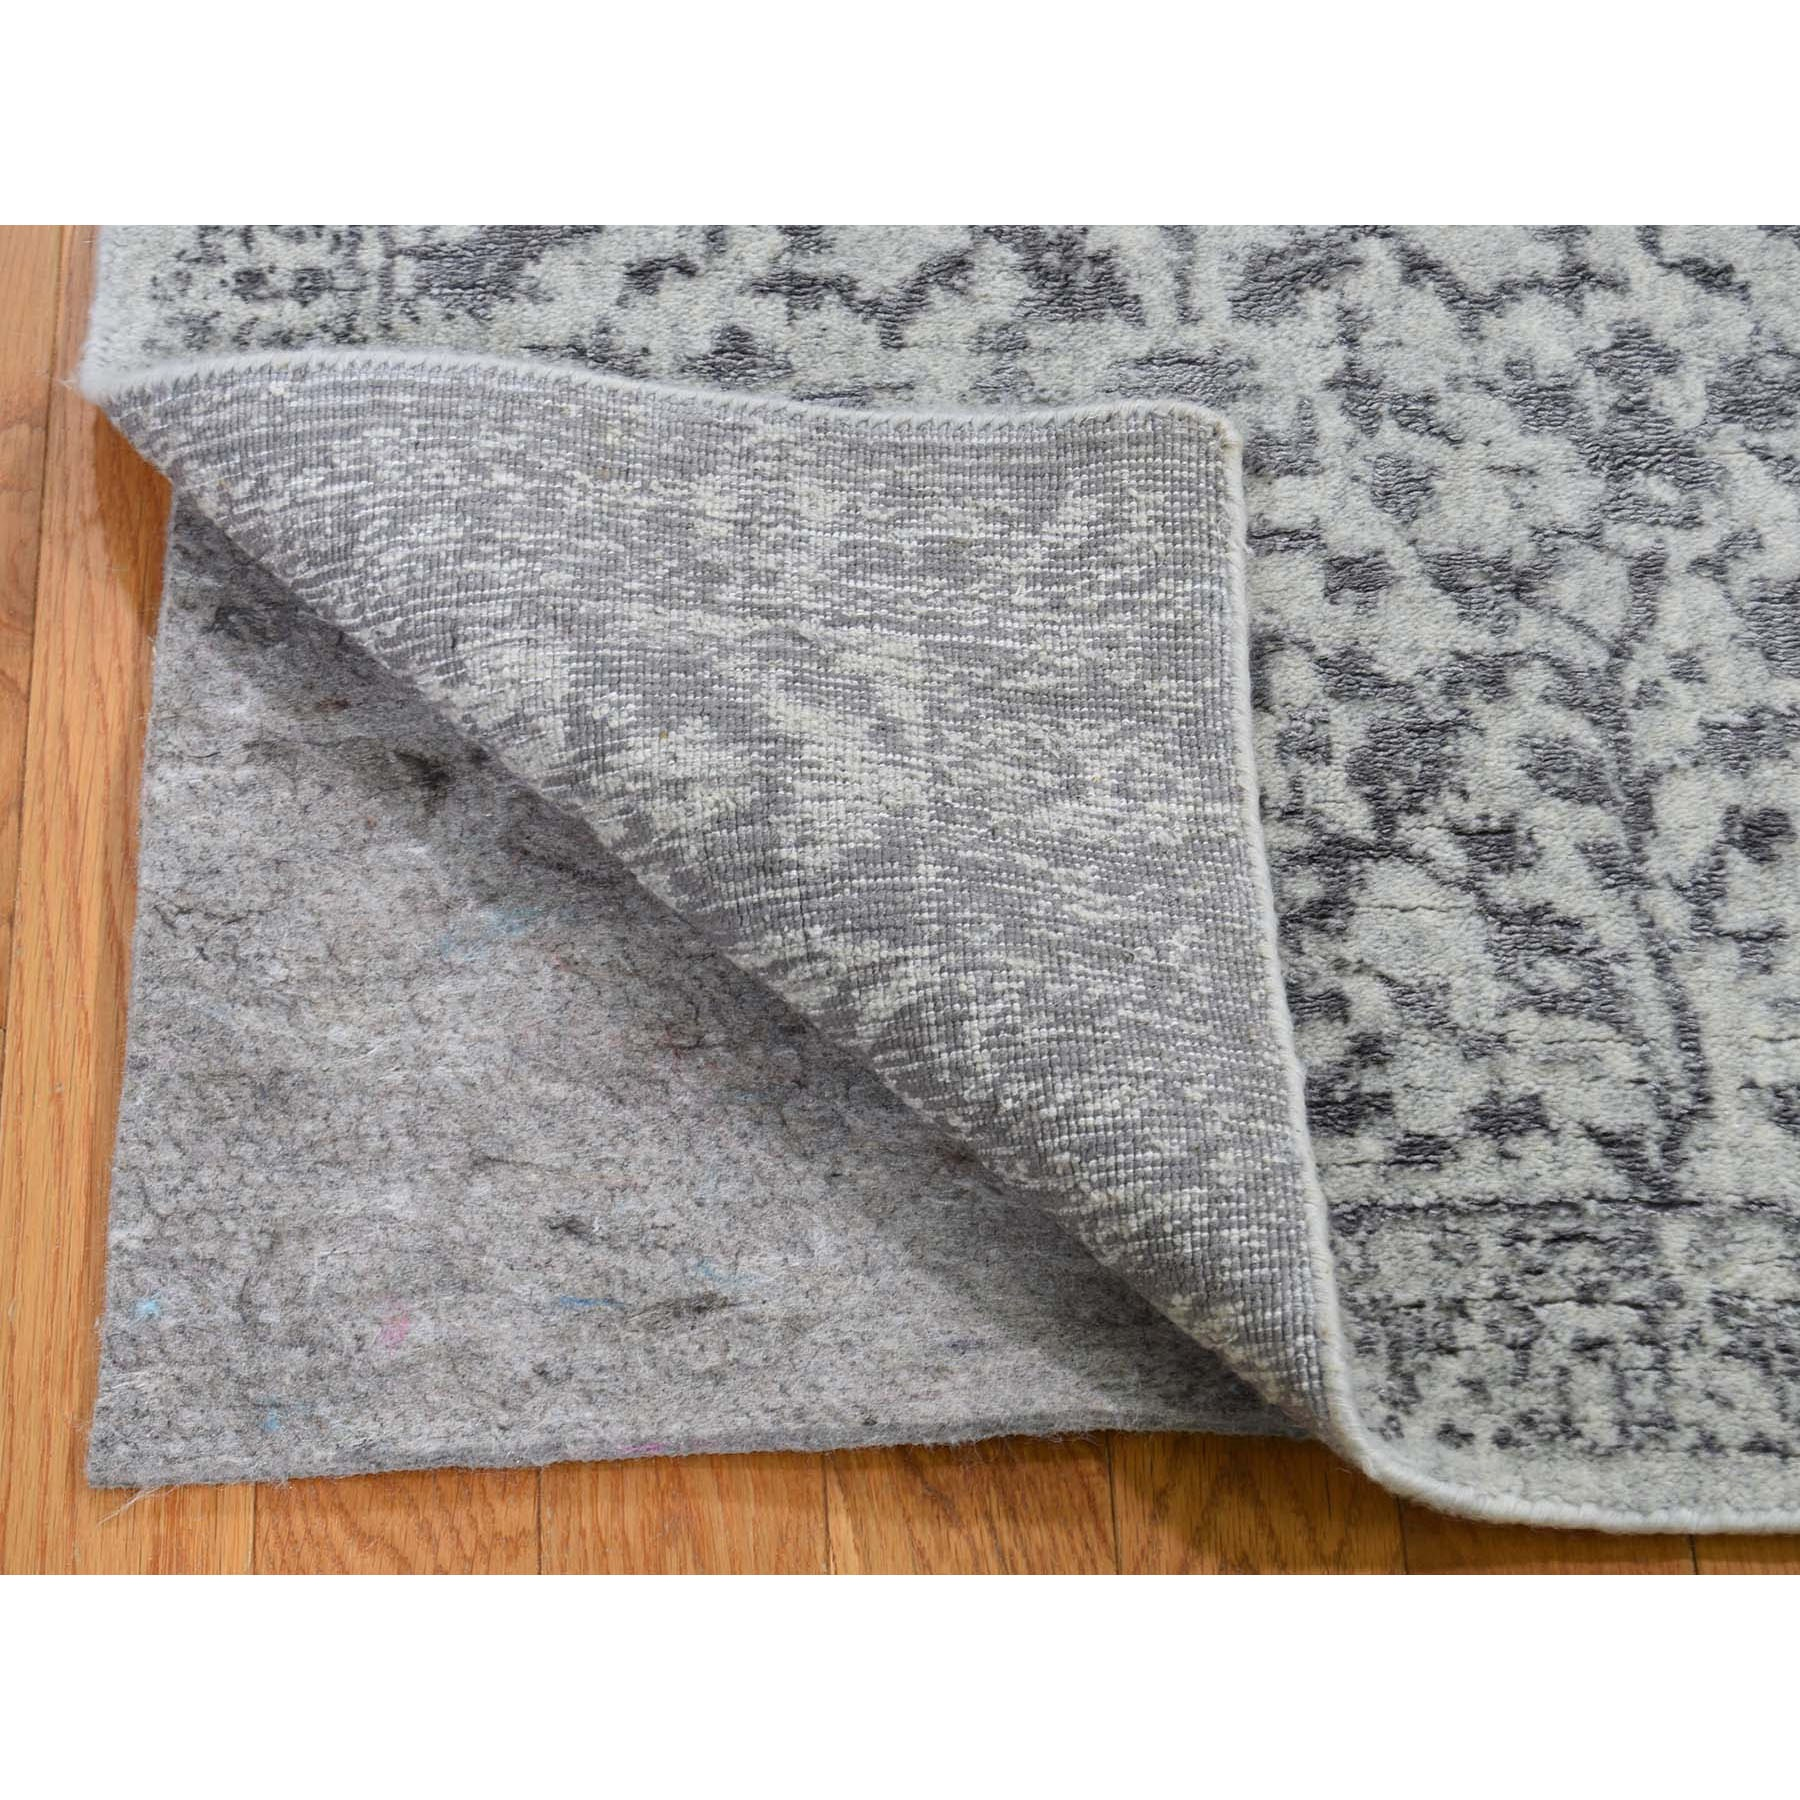 "2'5""x10'  Jacquard Hand-Loomed Gray Broken Cypress Tree Design Silken Thick And Plush Runner Oriental Rug"